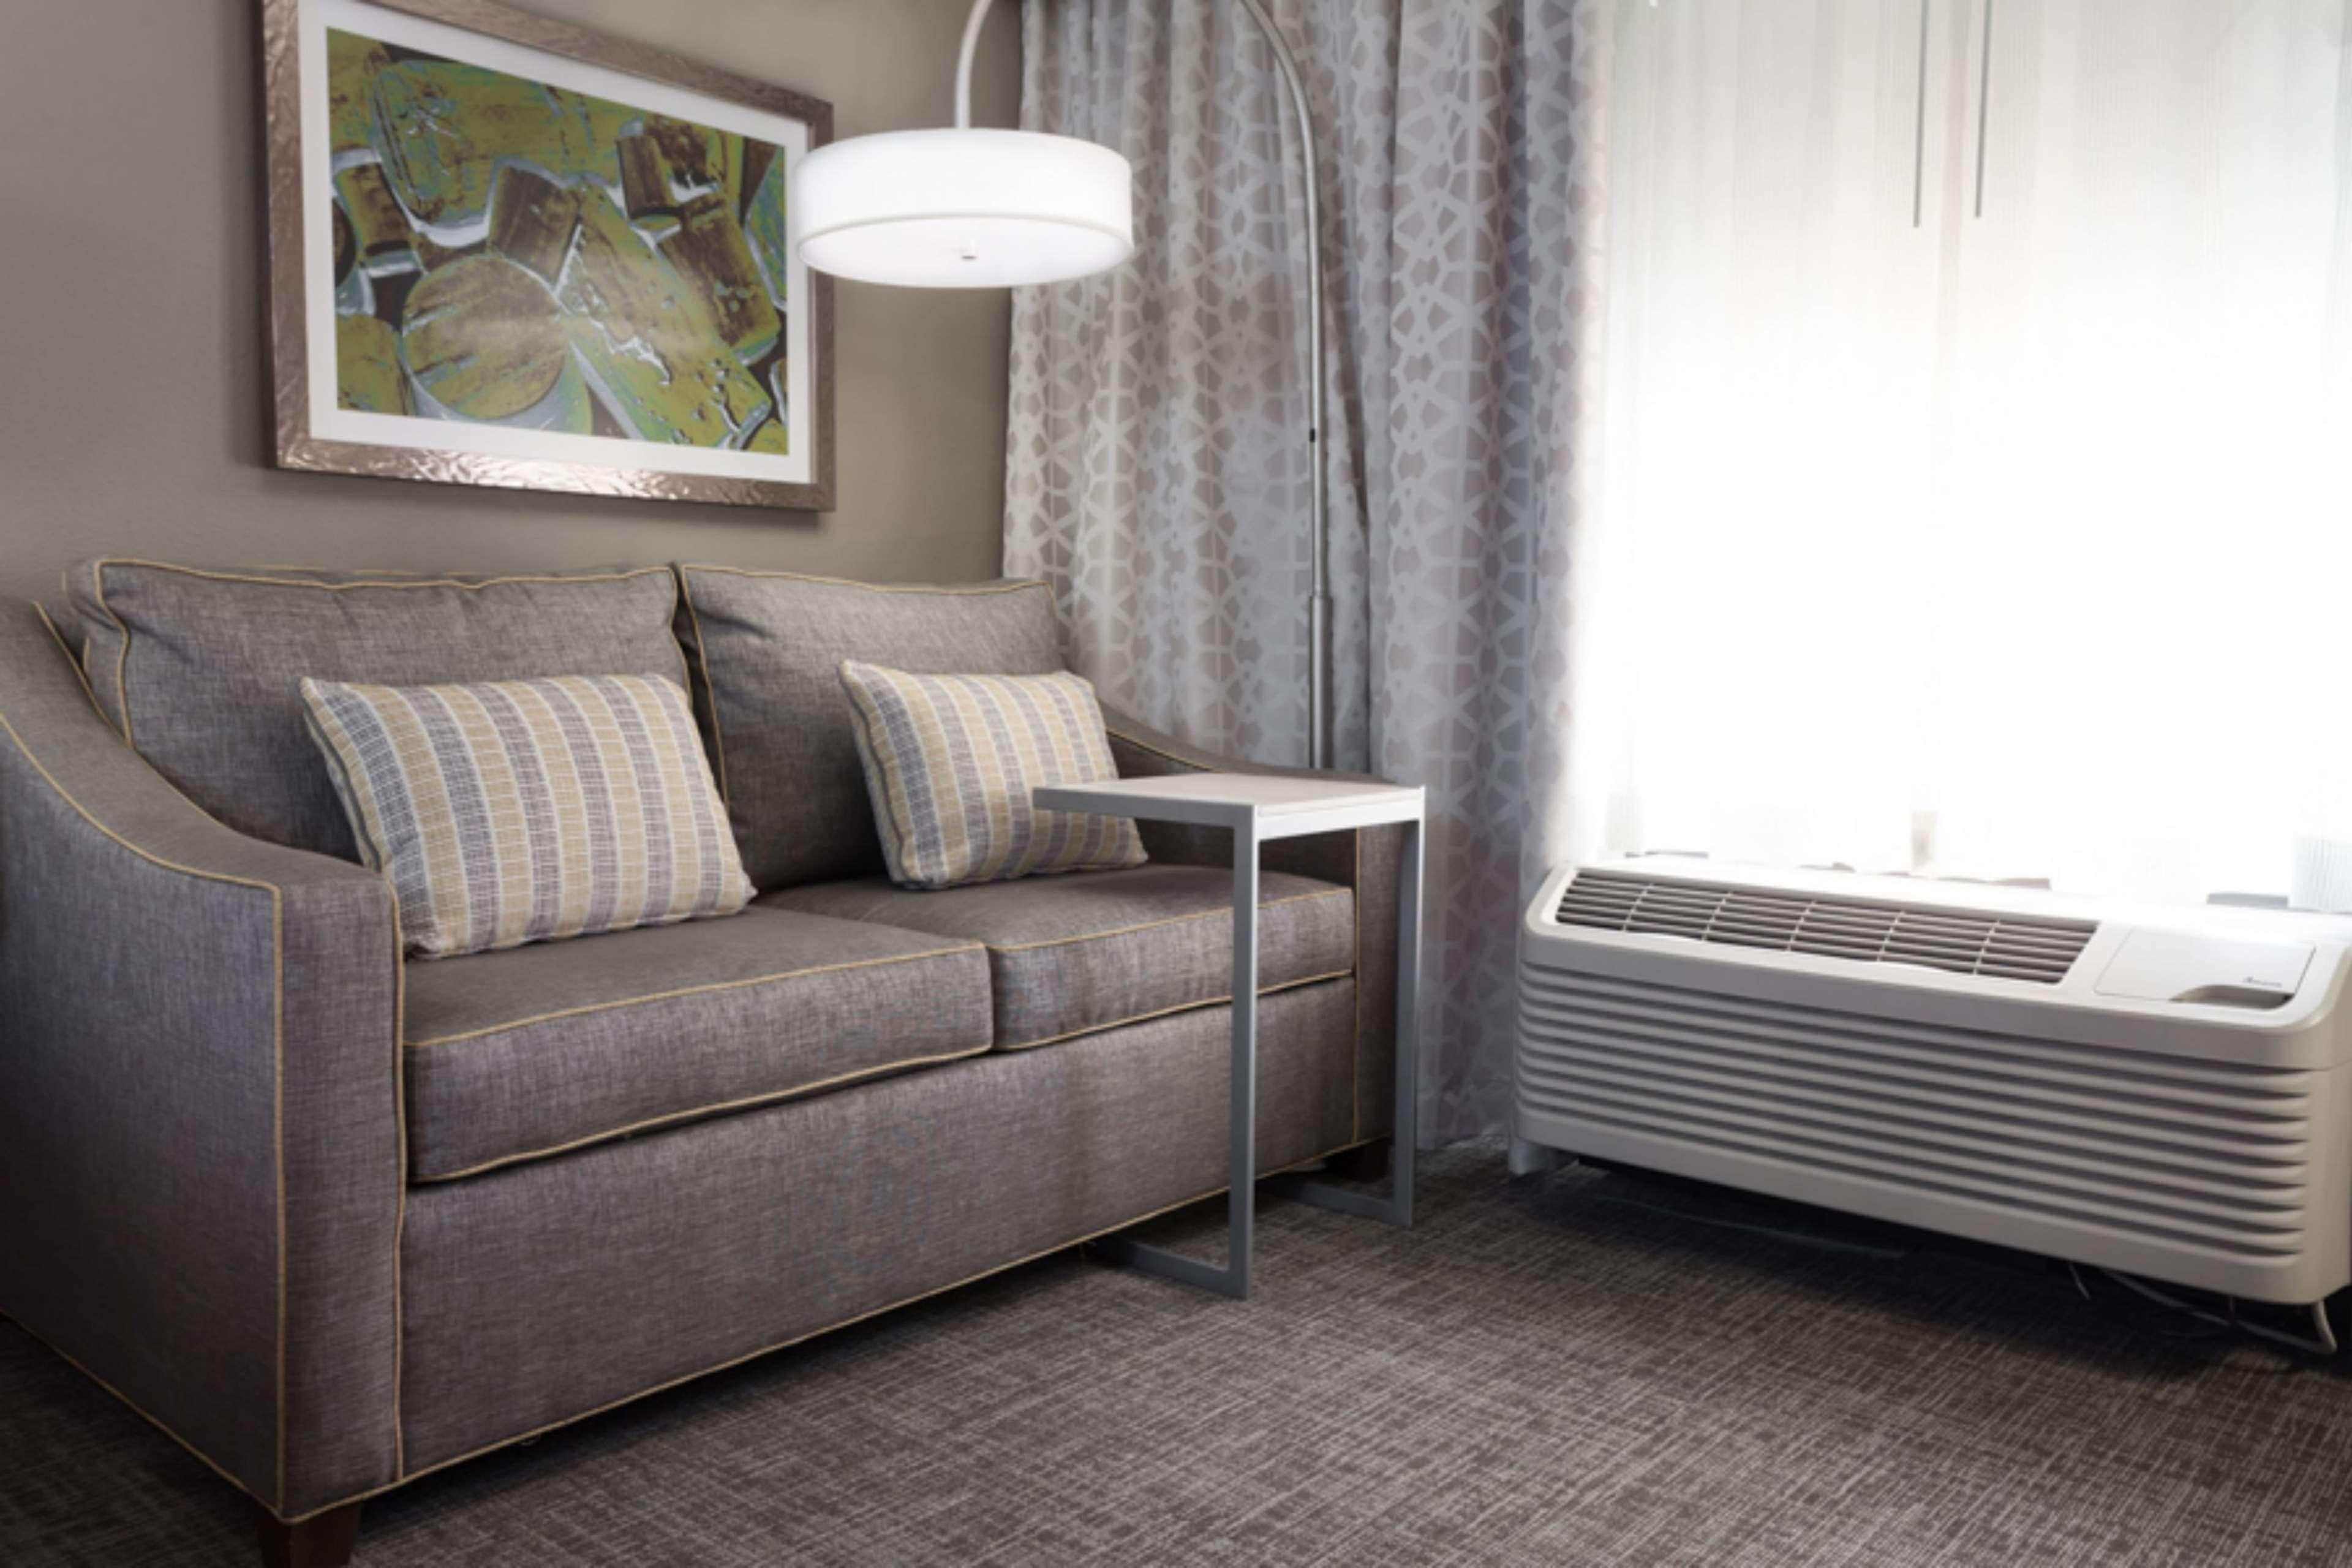 Hampton Inn & Suites Dallas-DFW Airport North-Grapevine image 21